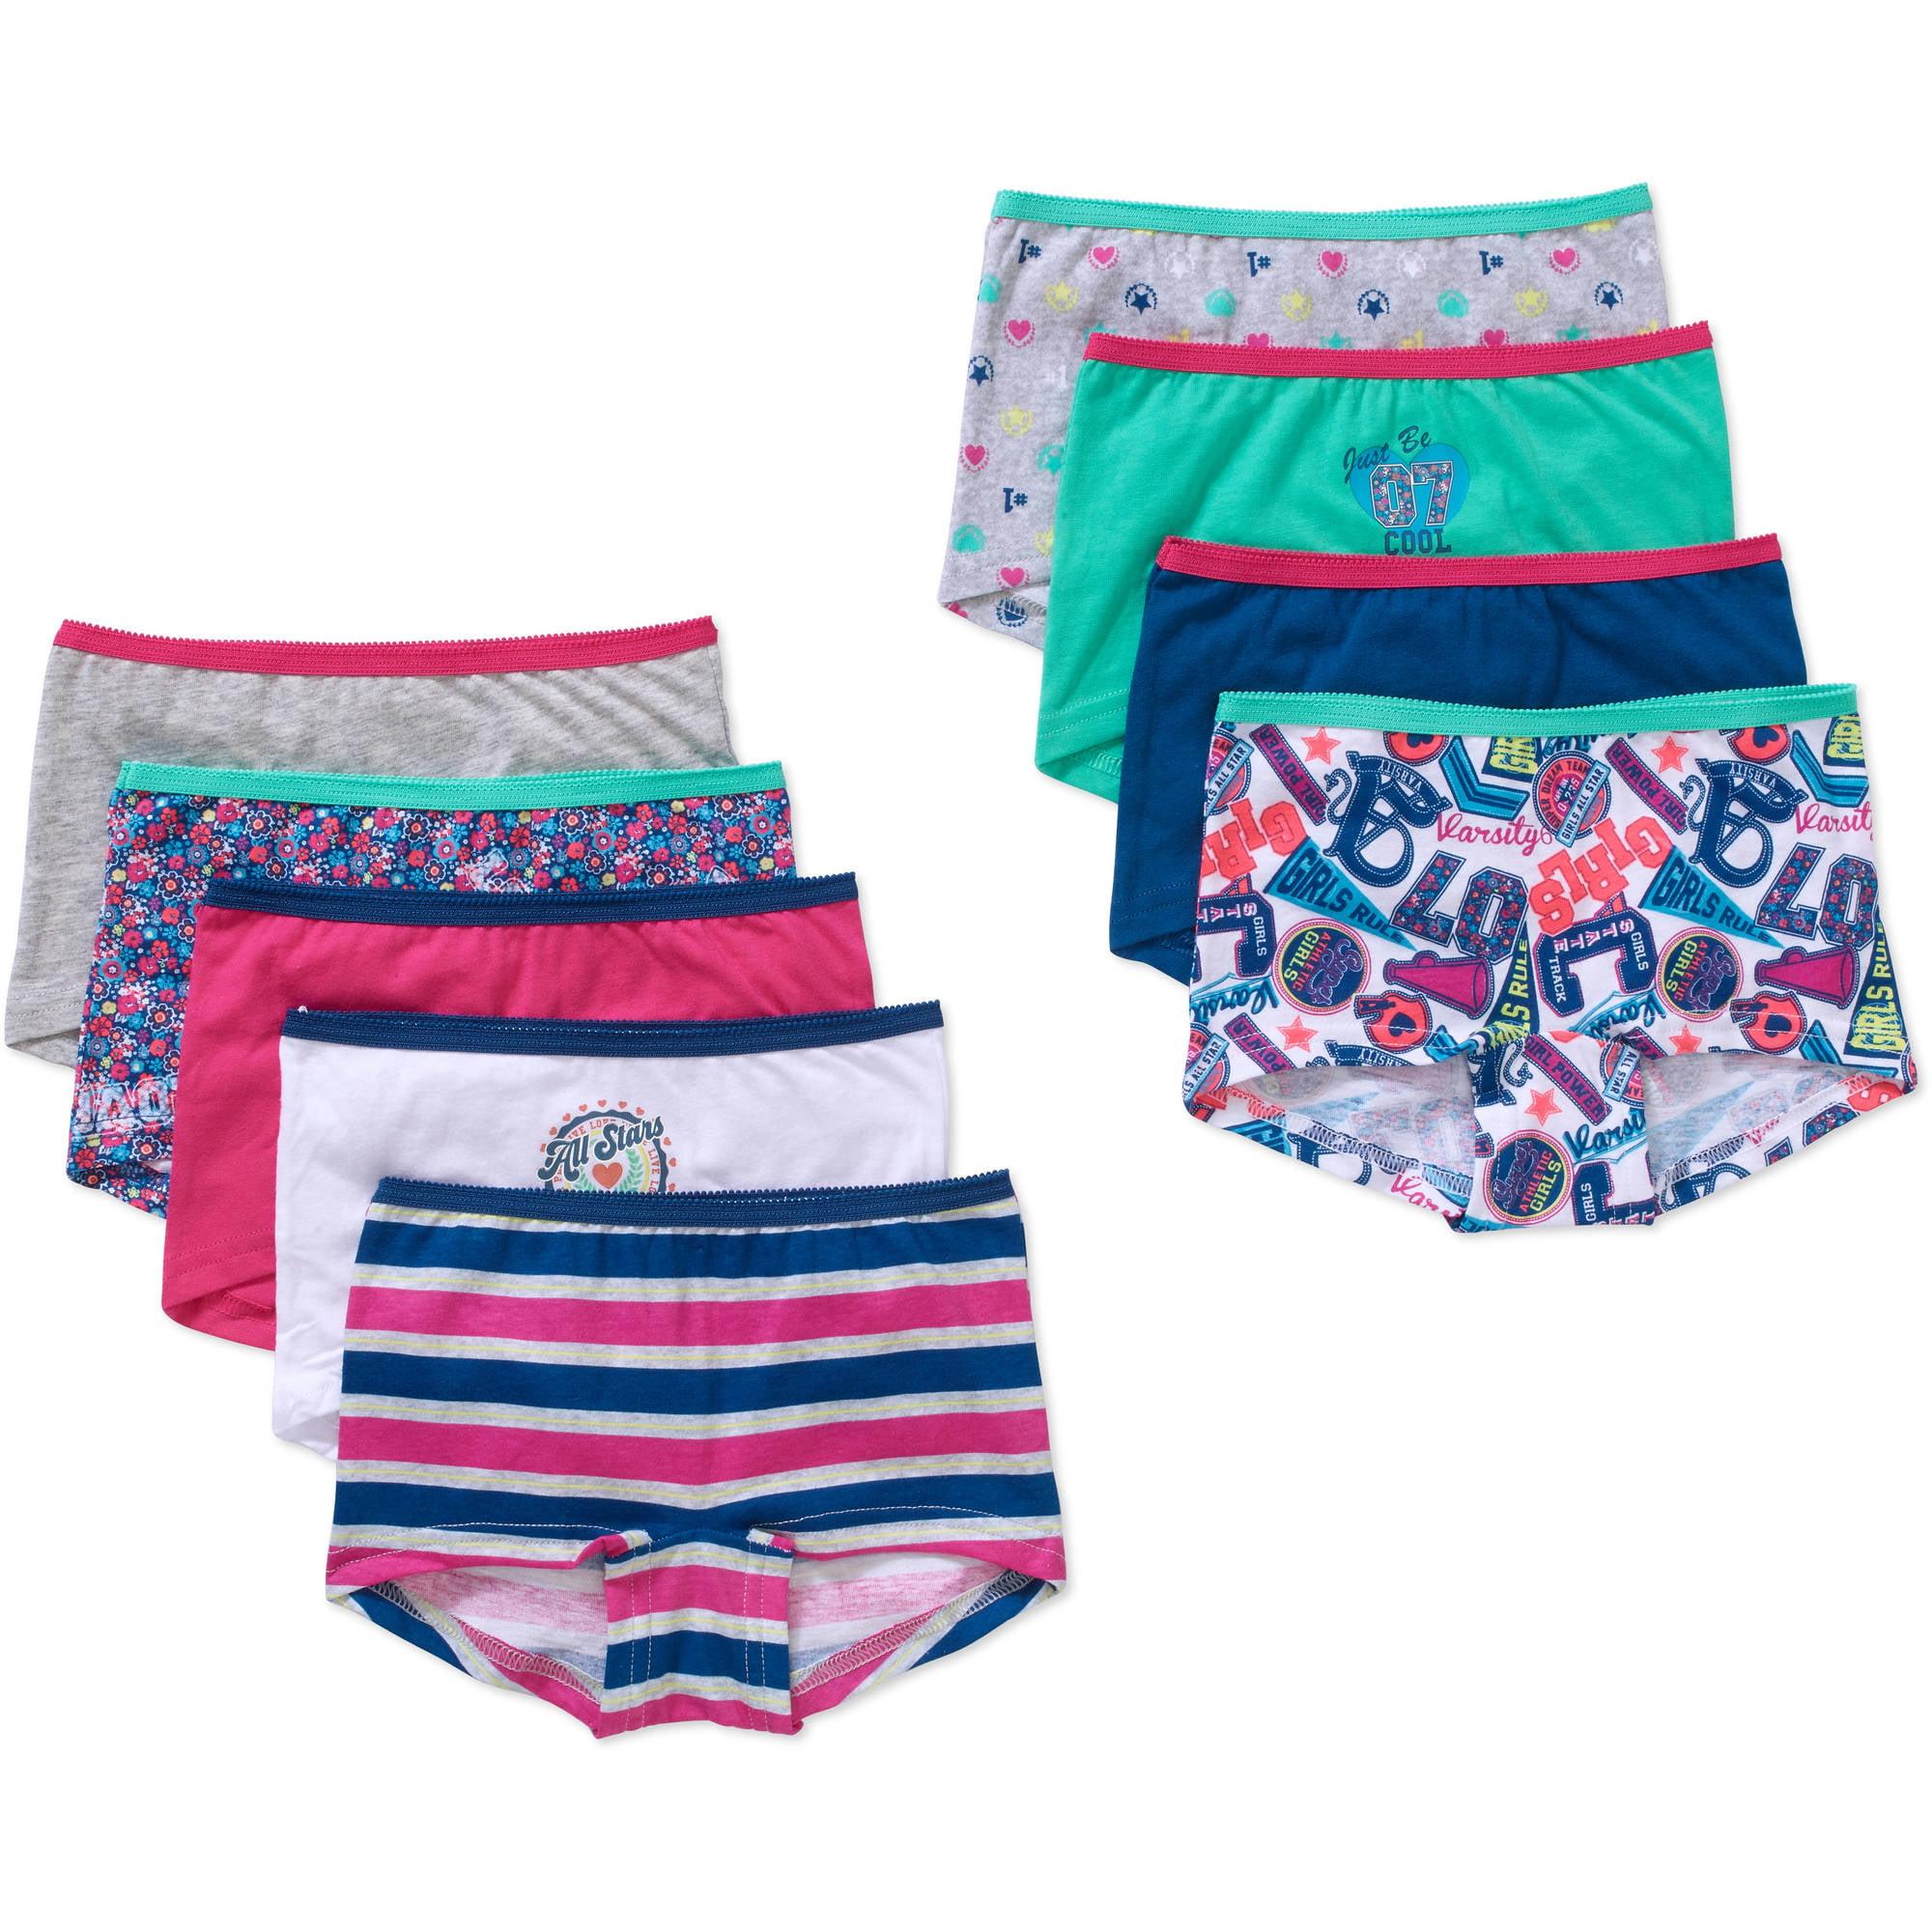 Girls' Cotton Boyshort Panty 9 Pack